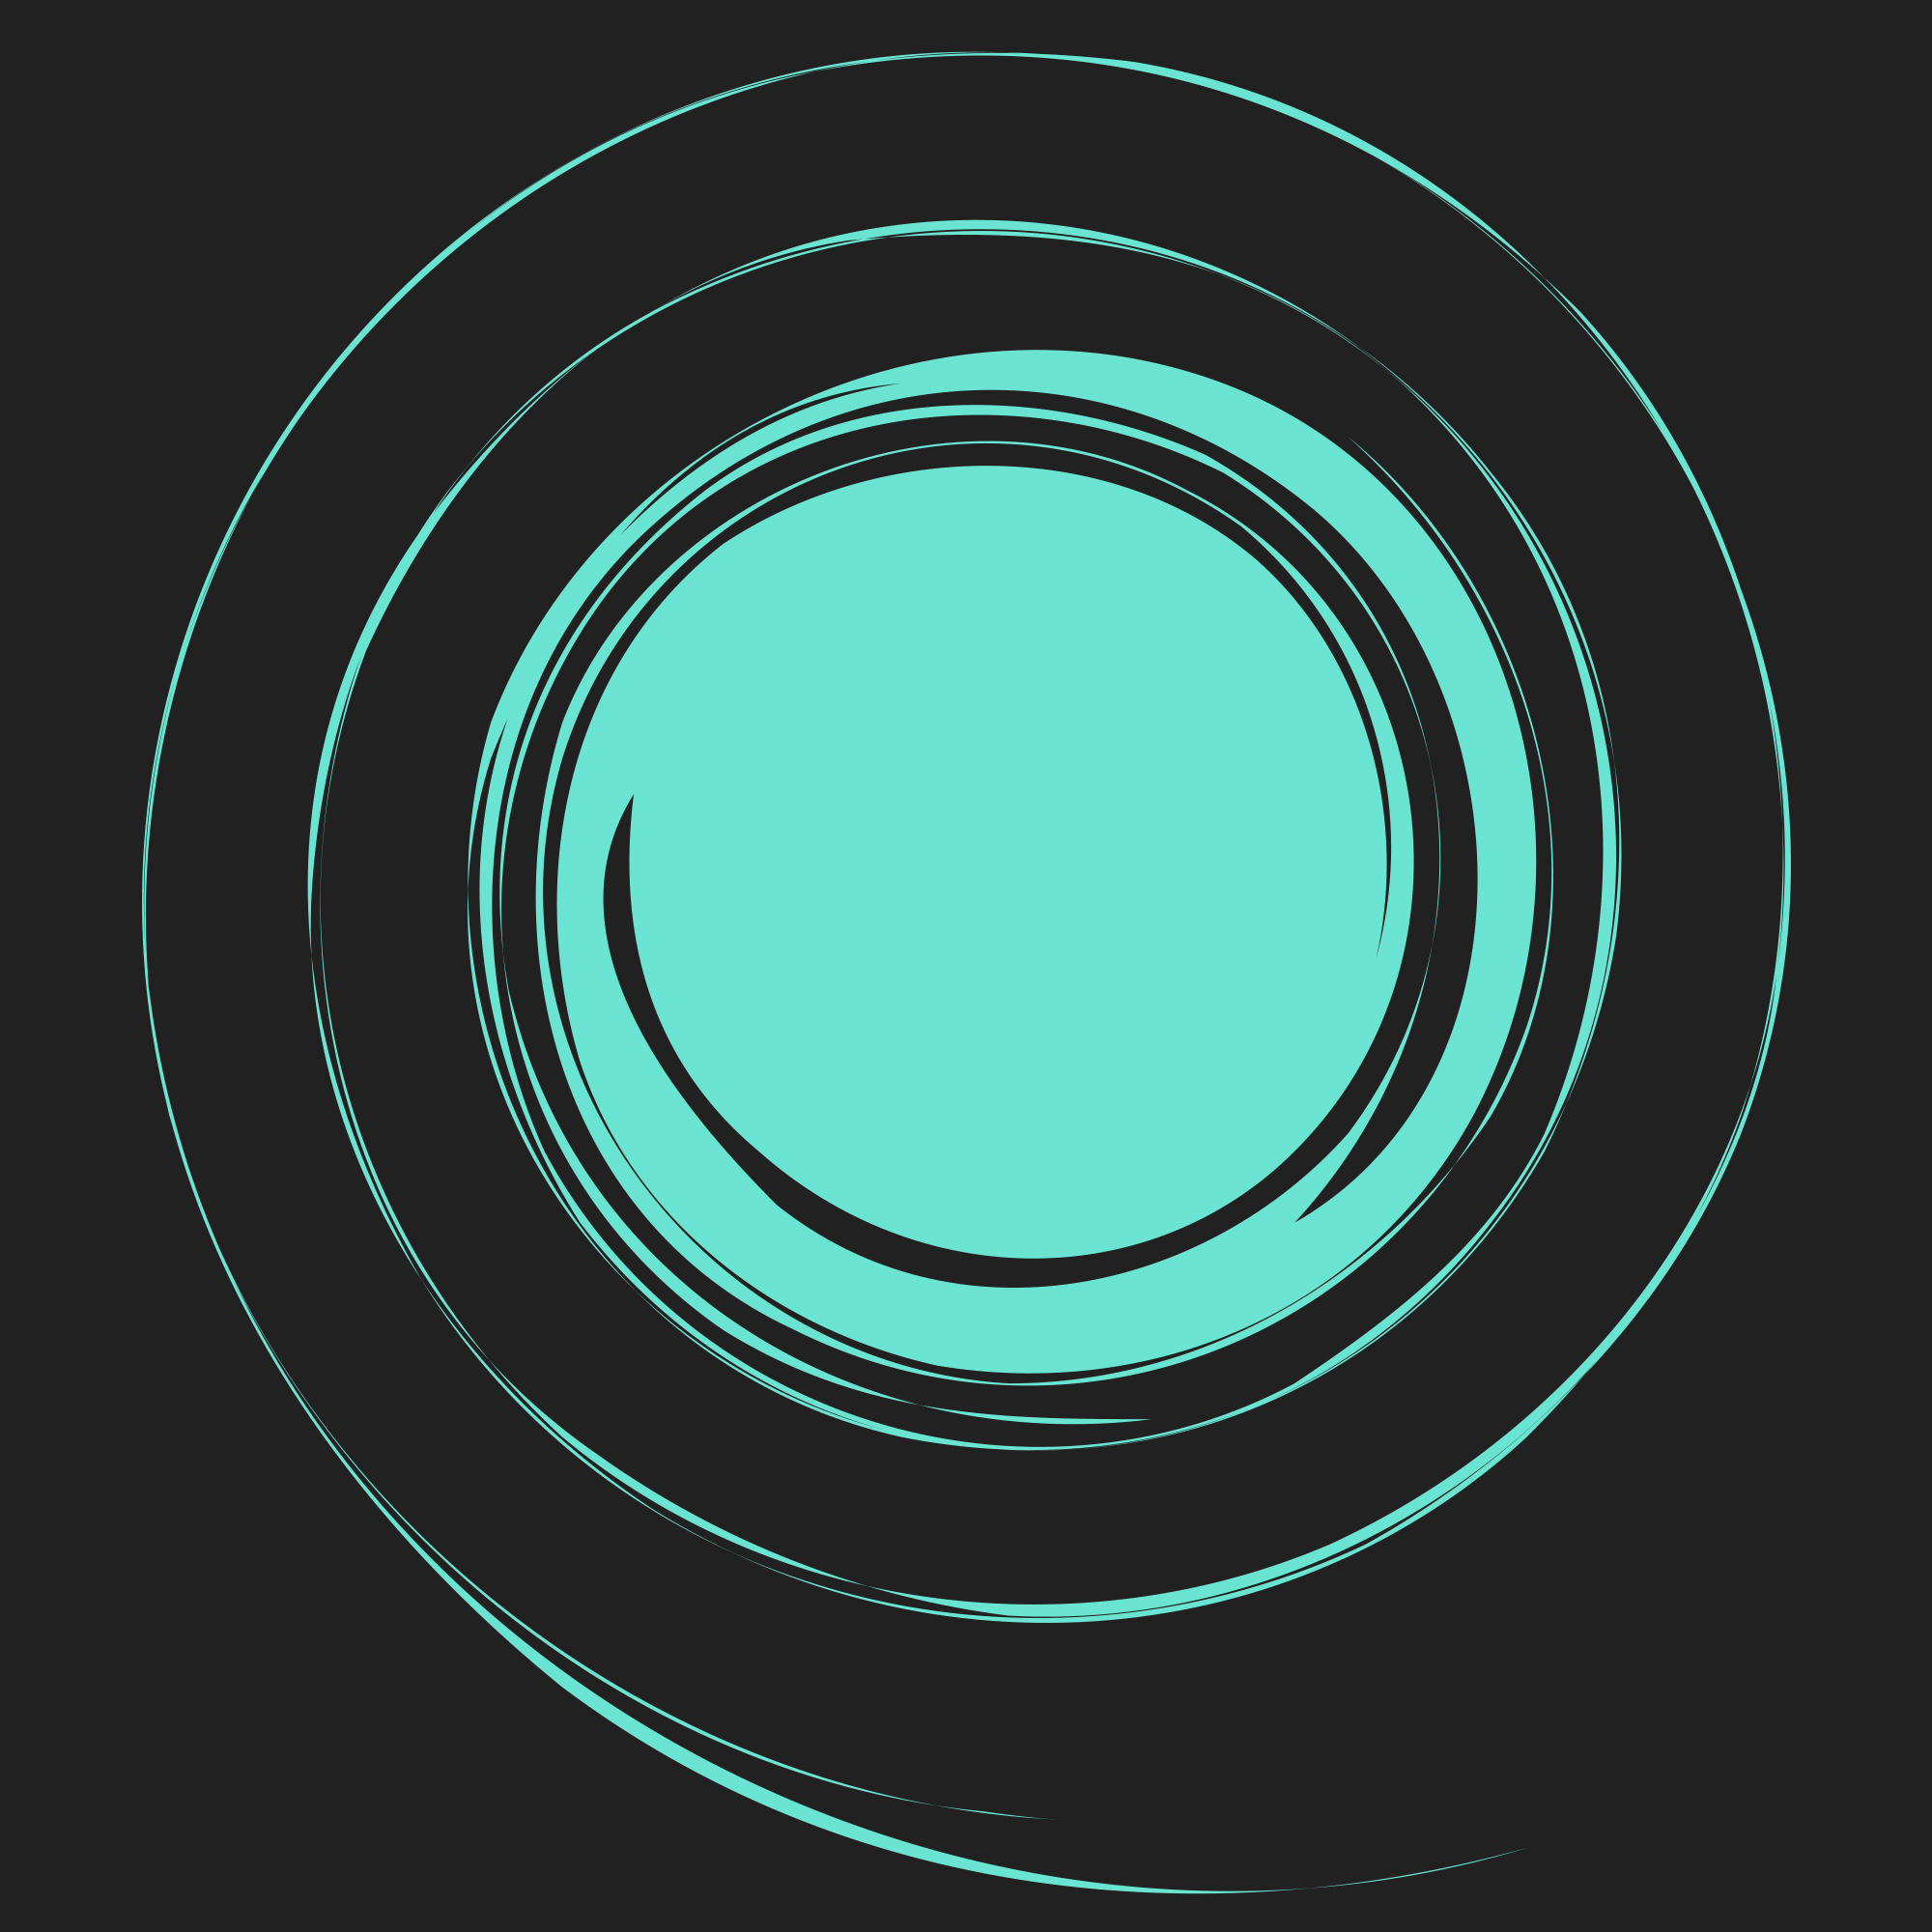 logo-swirl-turquoise-grey | Alison Drury